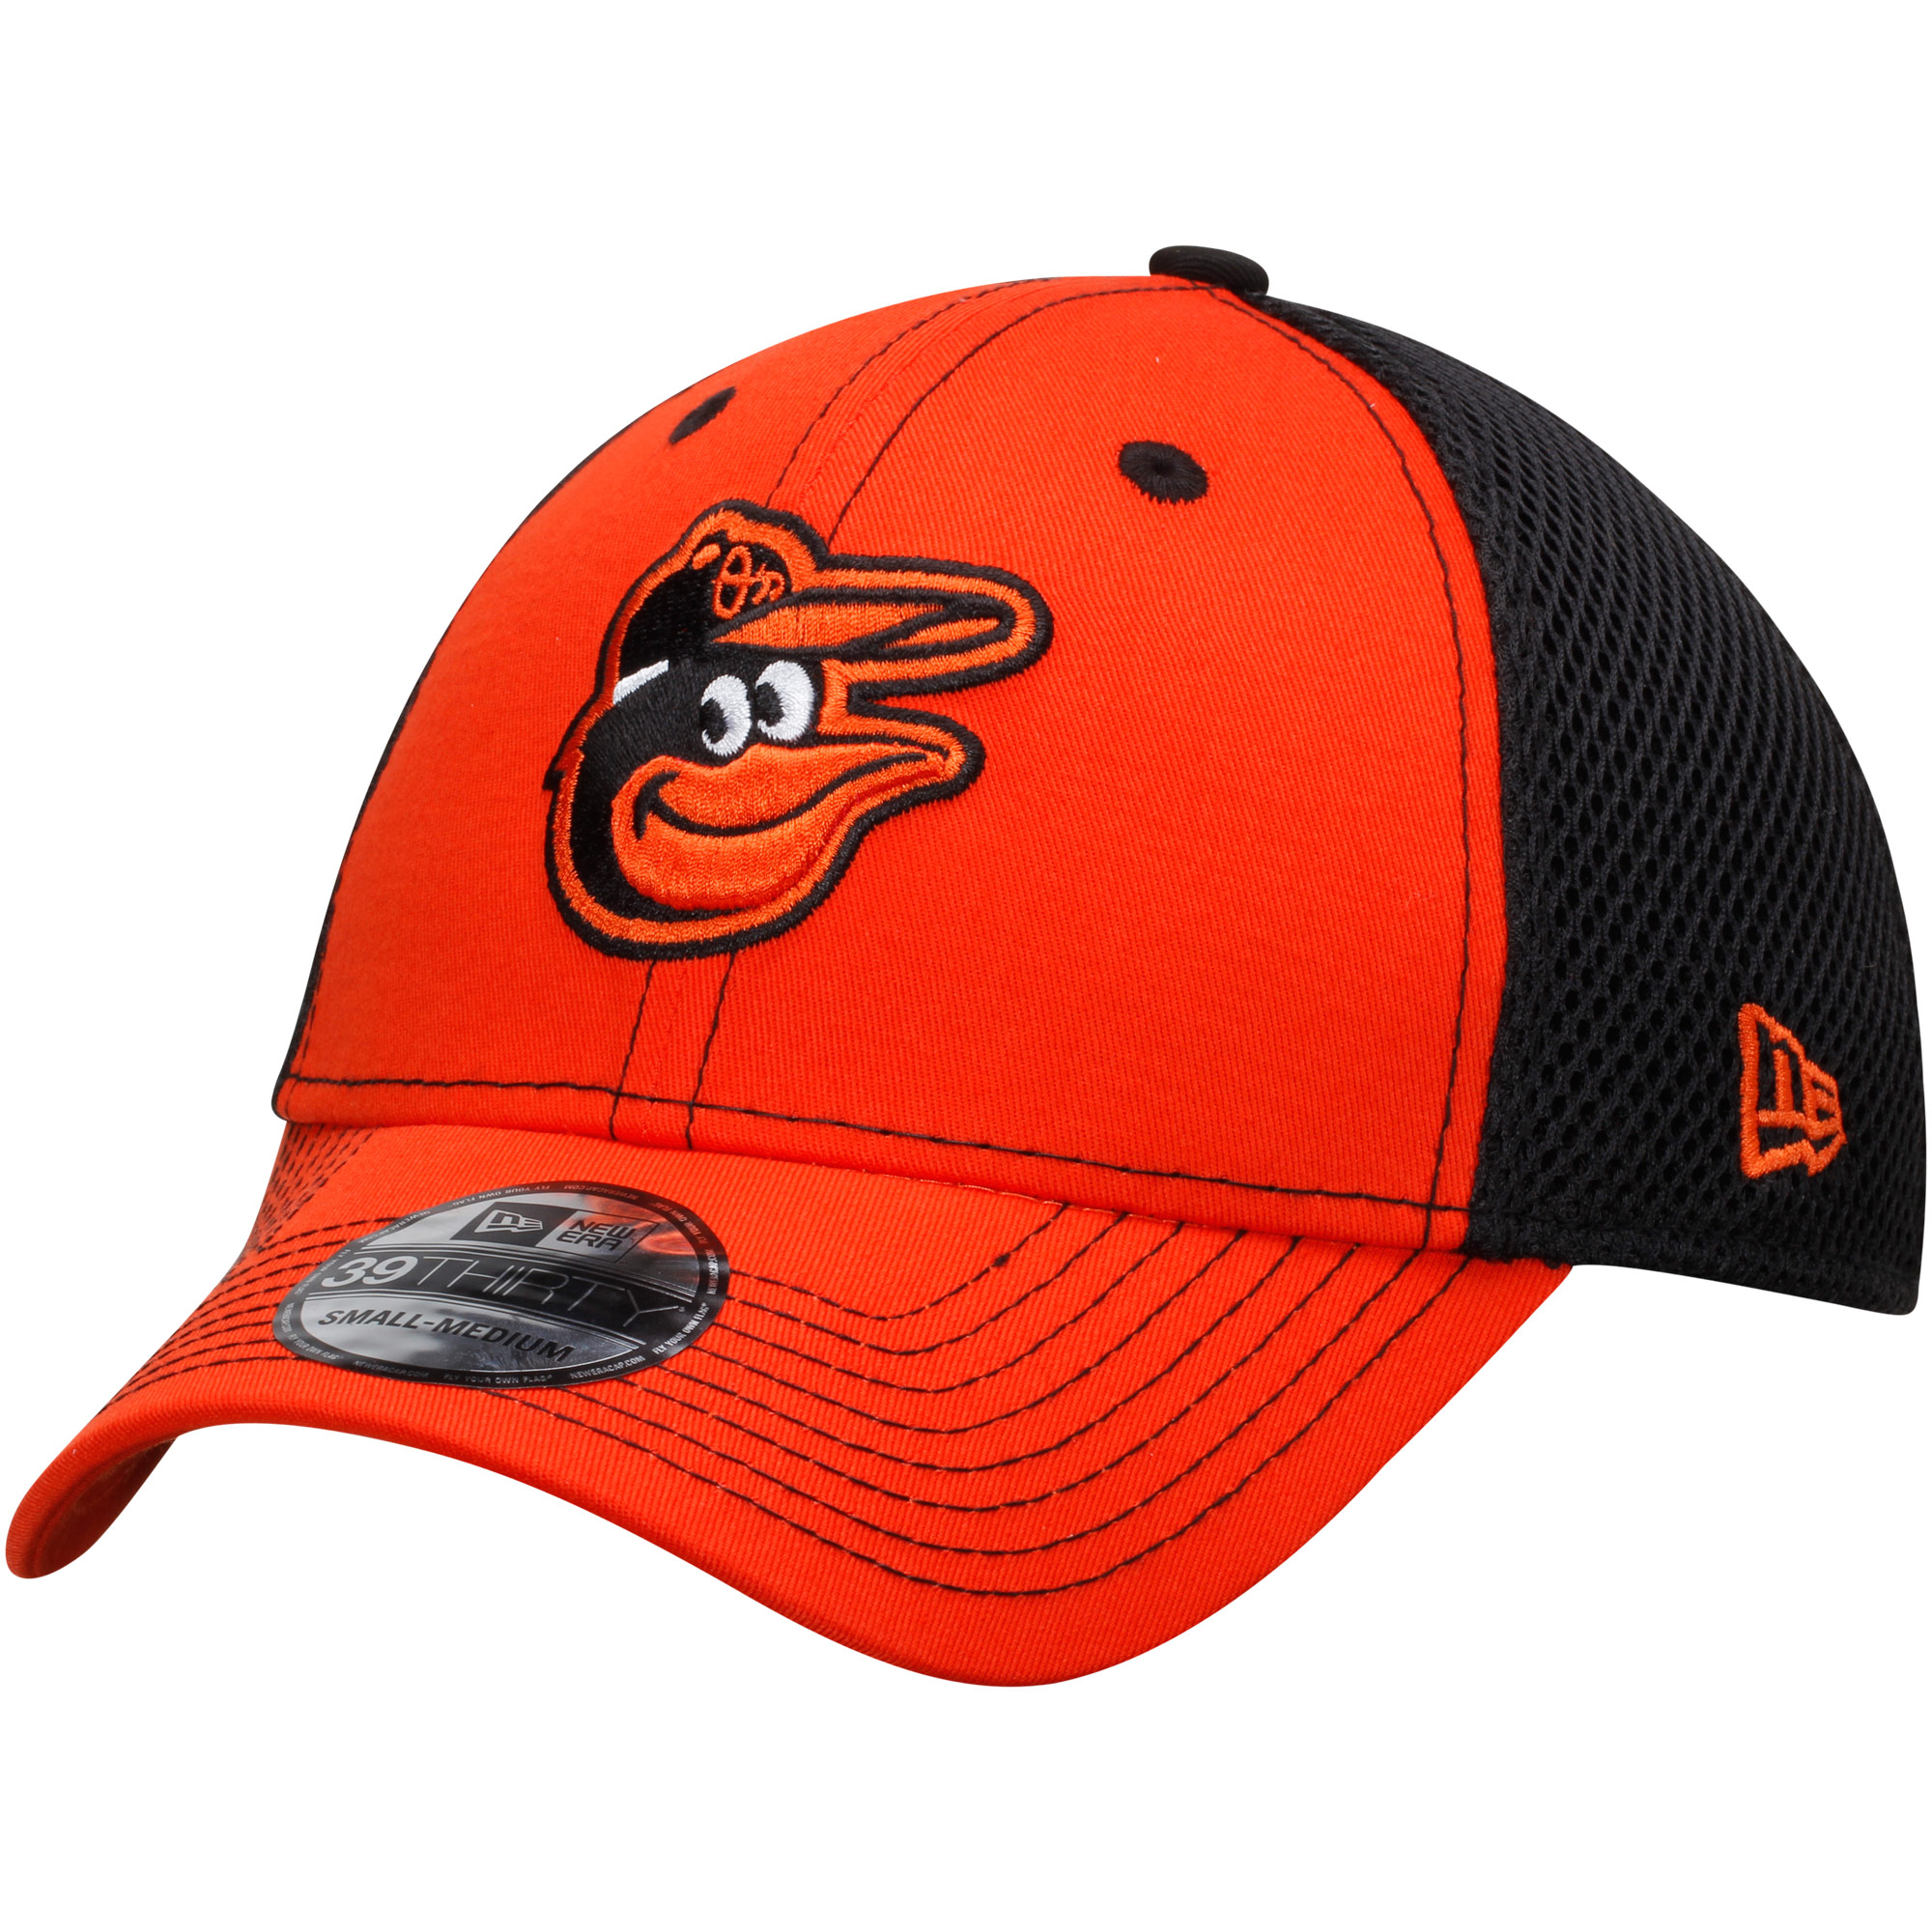 Baltimore Orioles New Era Team Front Neo 39THIRTY Flex Hat - Orange/Black